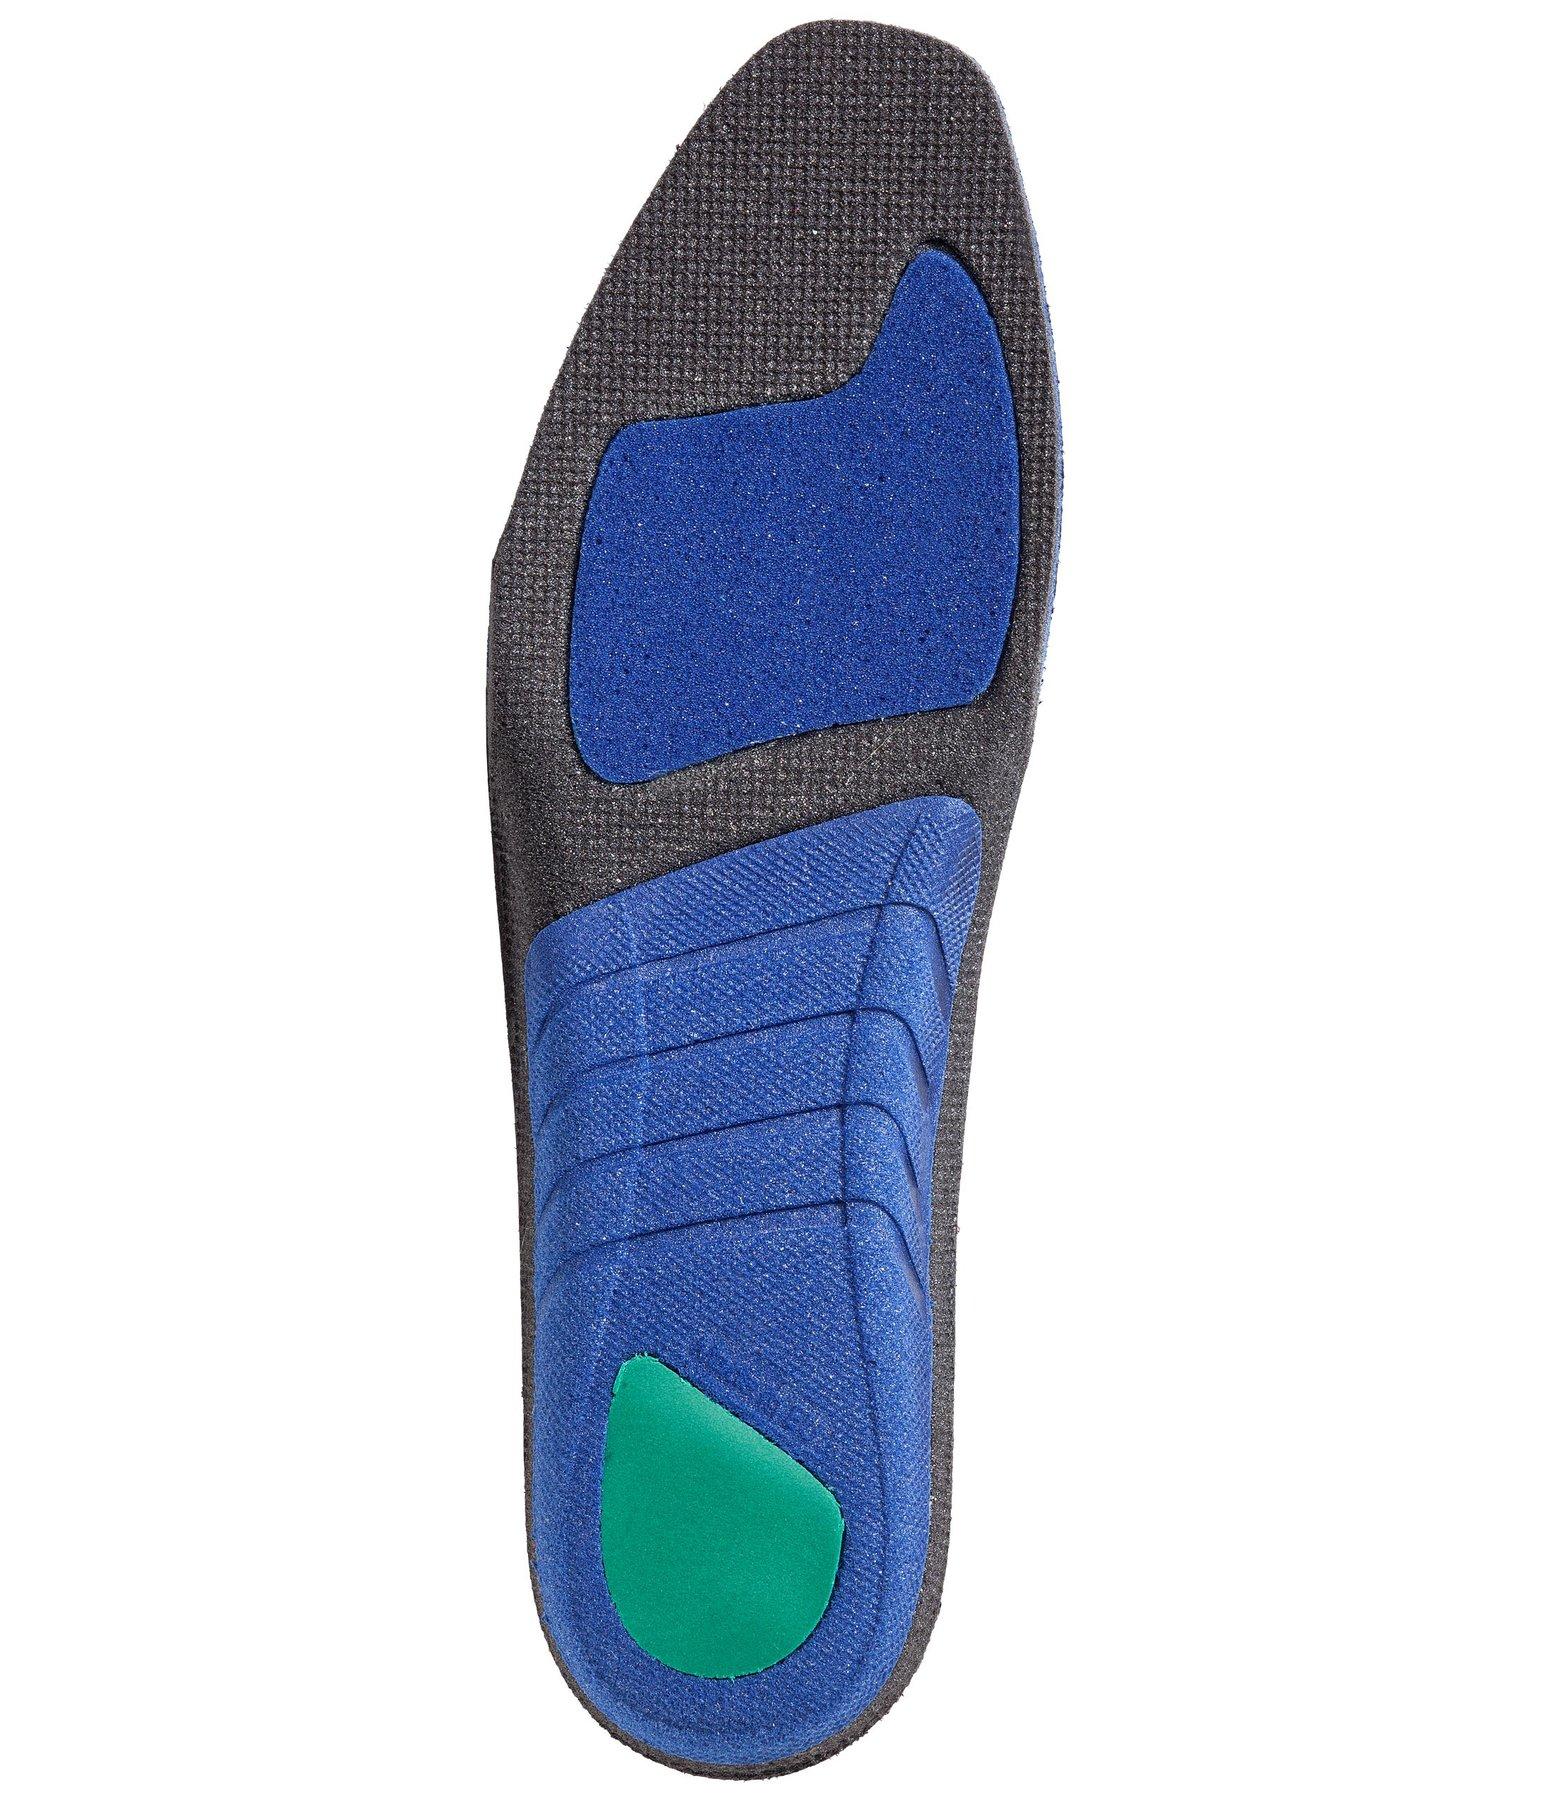 f02e01158d33 Insole Comfort Footbed Technology - Footwear Accessories - Kramer ...